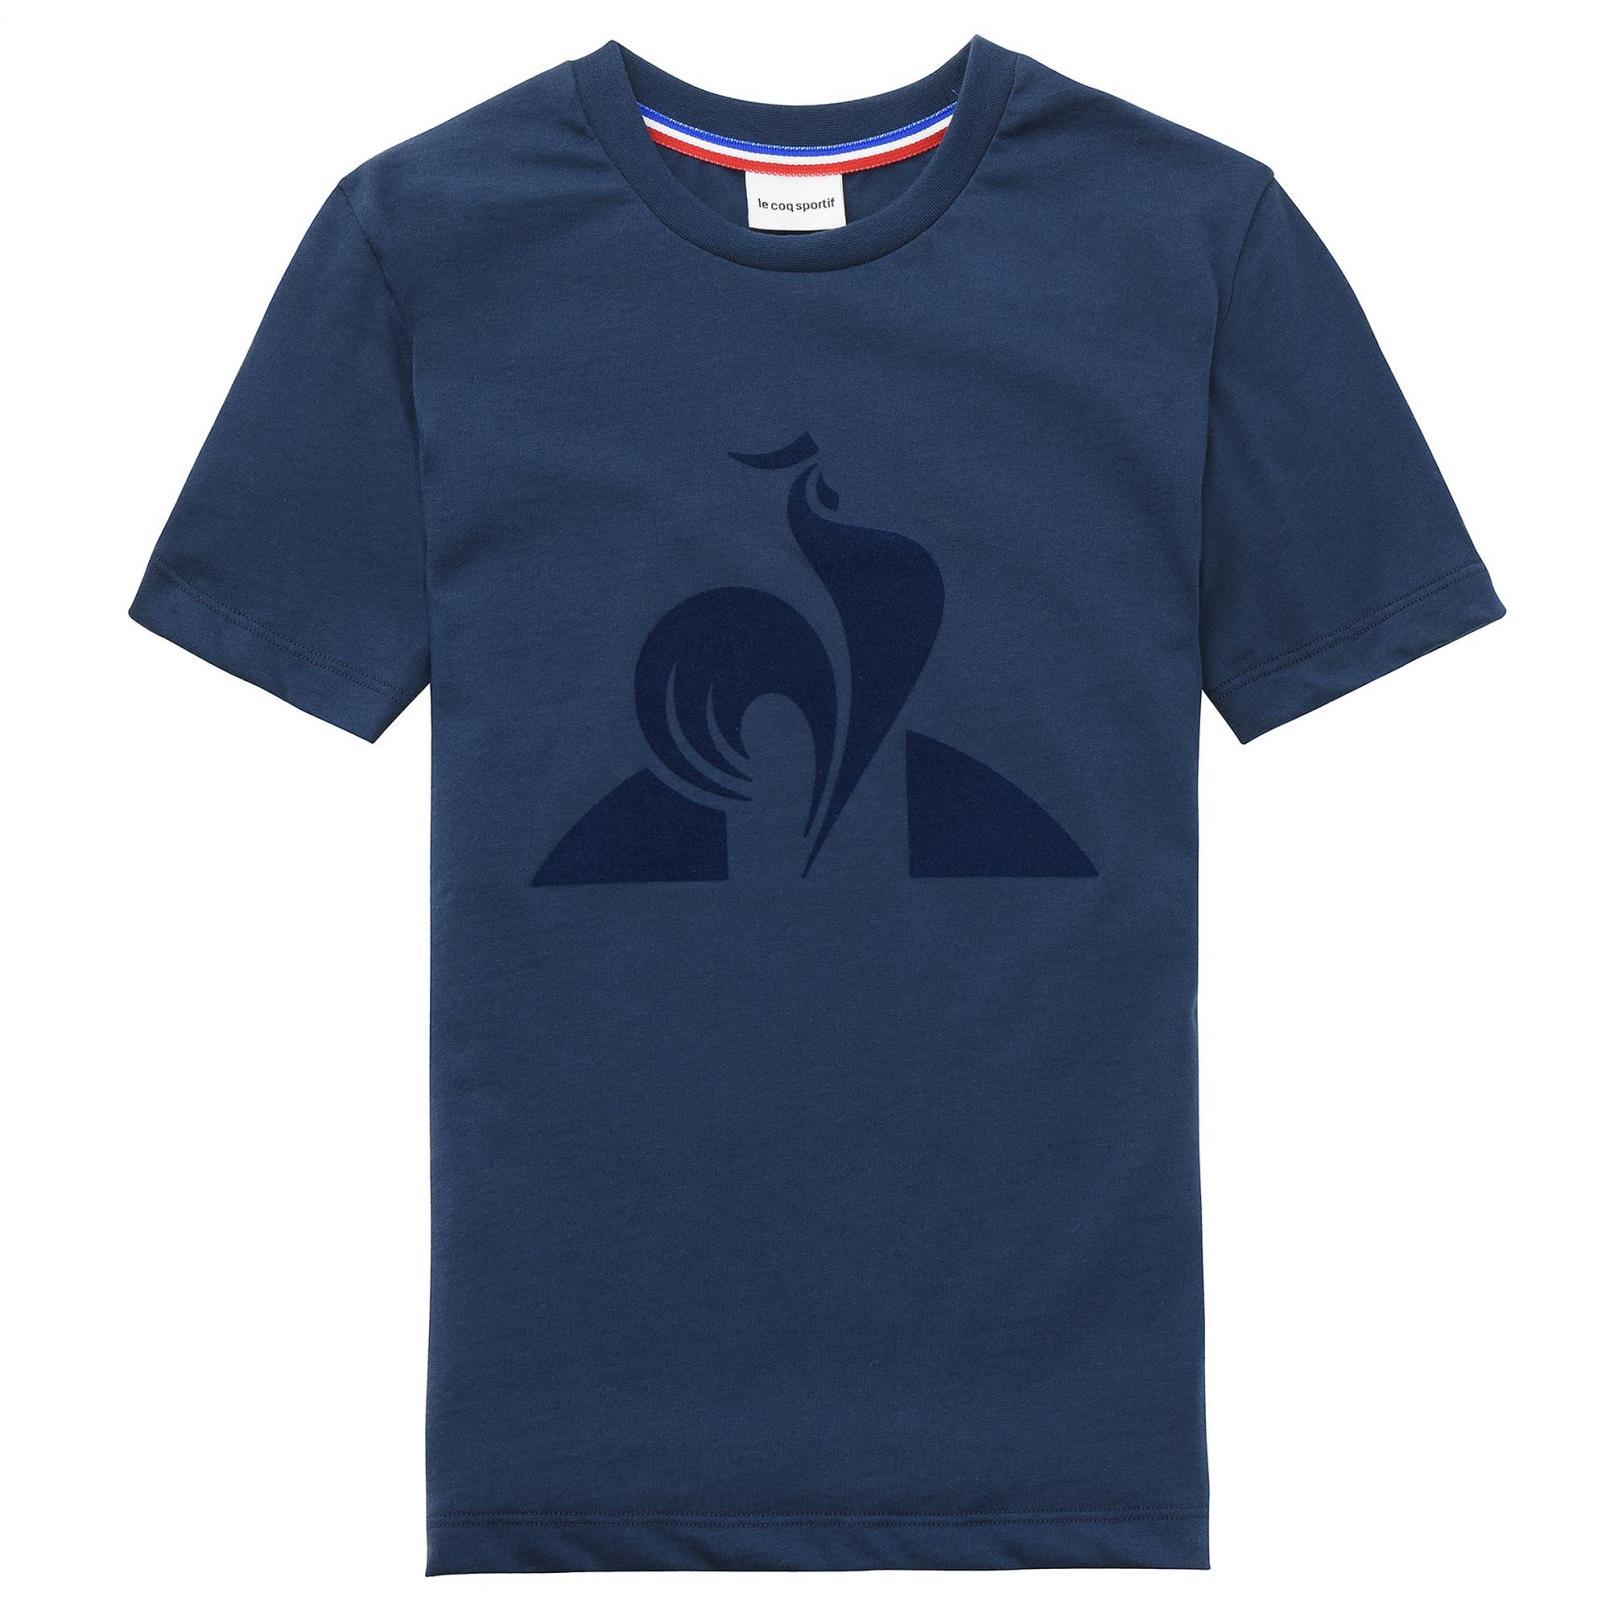 Kids Apparel – Le Coq Sportif Essentiels T-shirt Blue